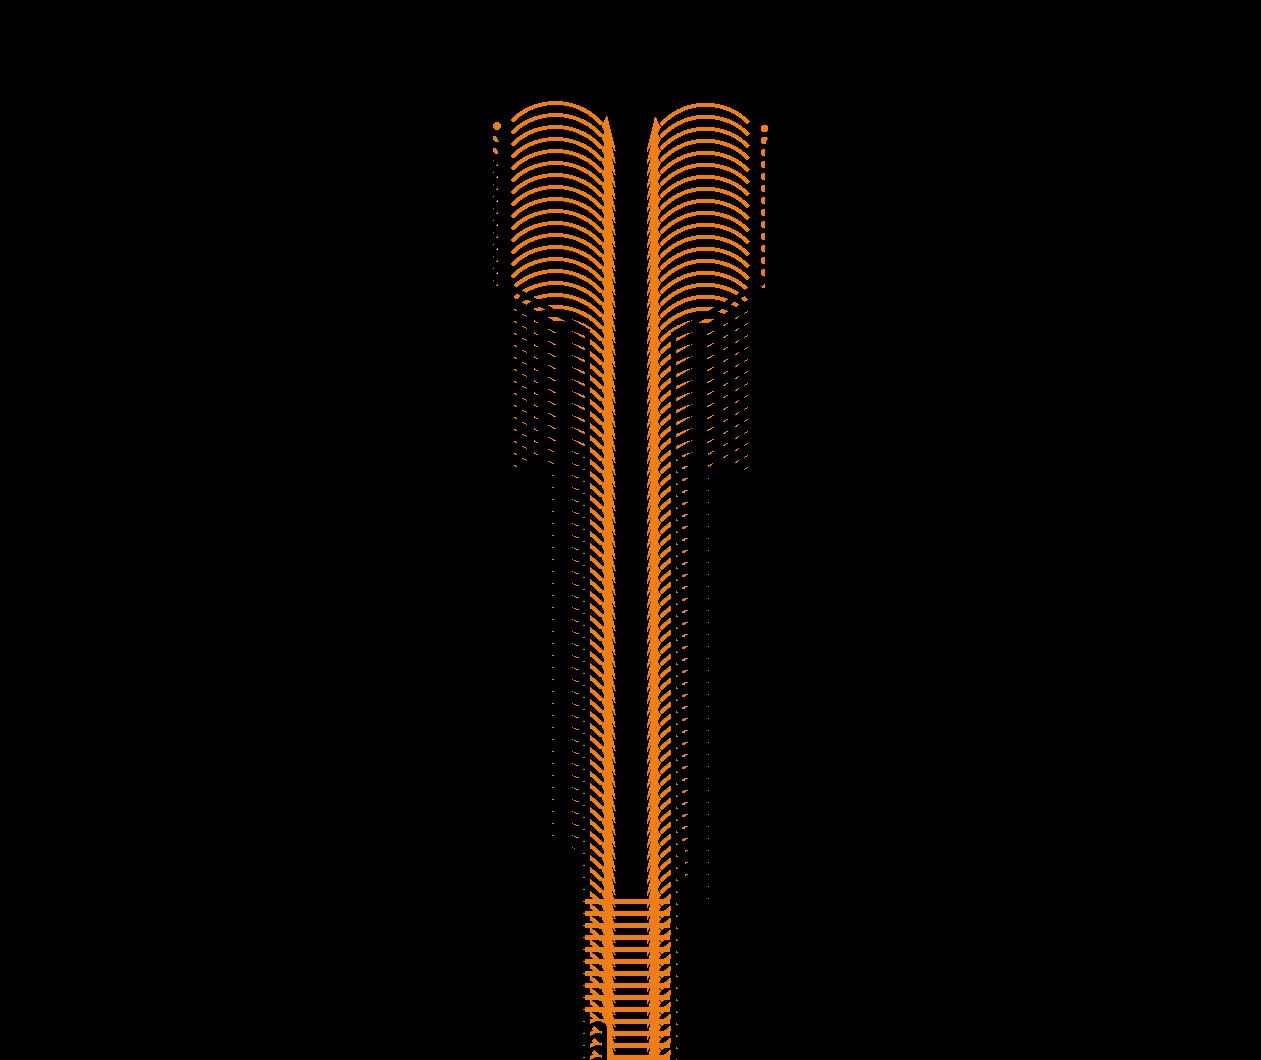 Makromoleküle: Polymersynthese I: Radikalische Polymerisation